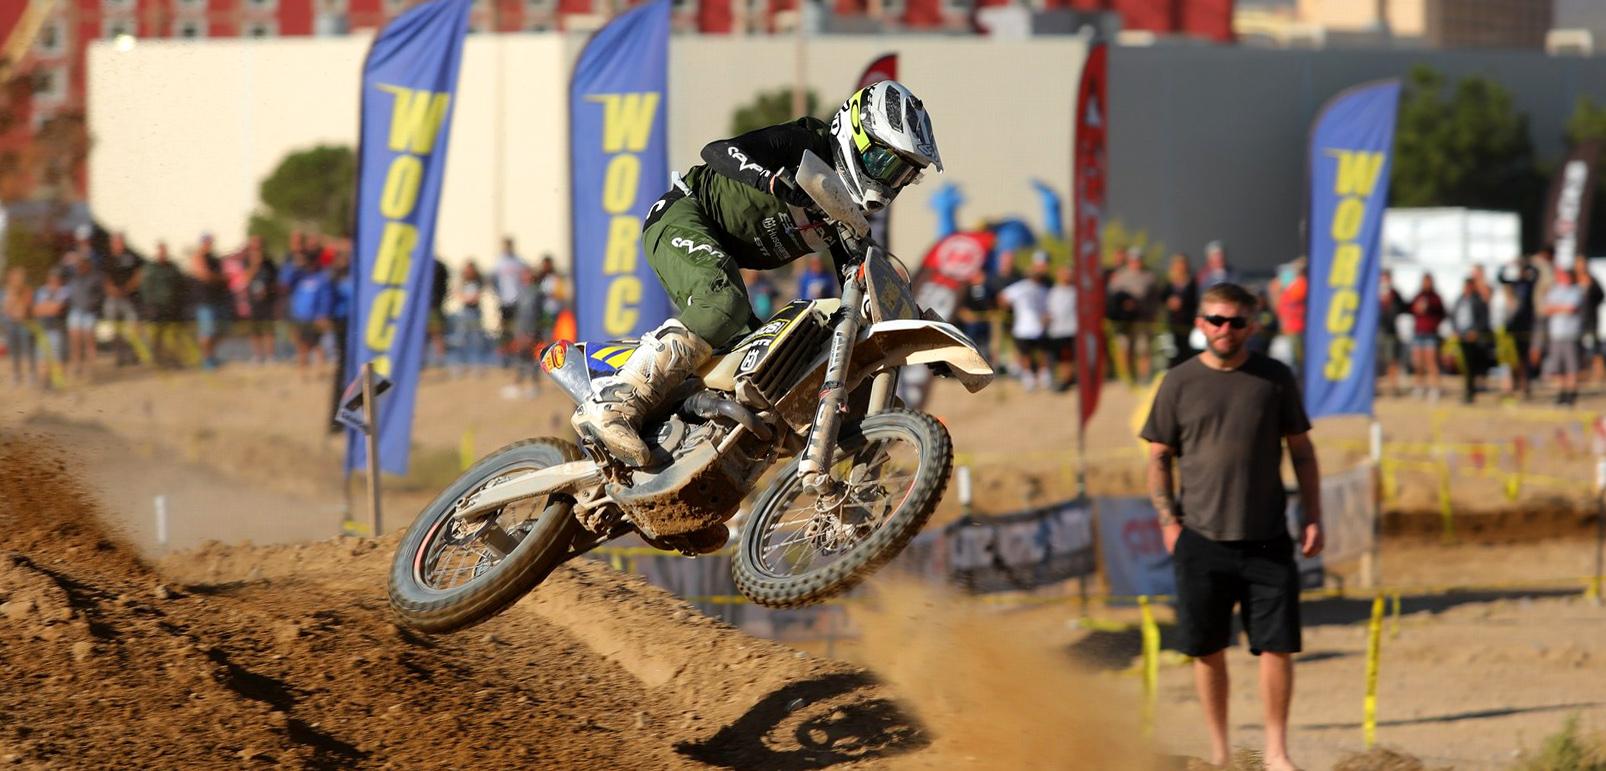 2018-09-zach-bell-jump-bike-worcs-racing